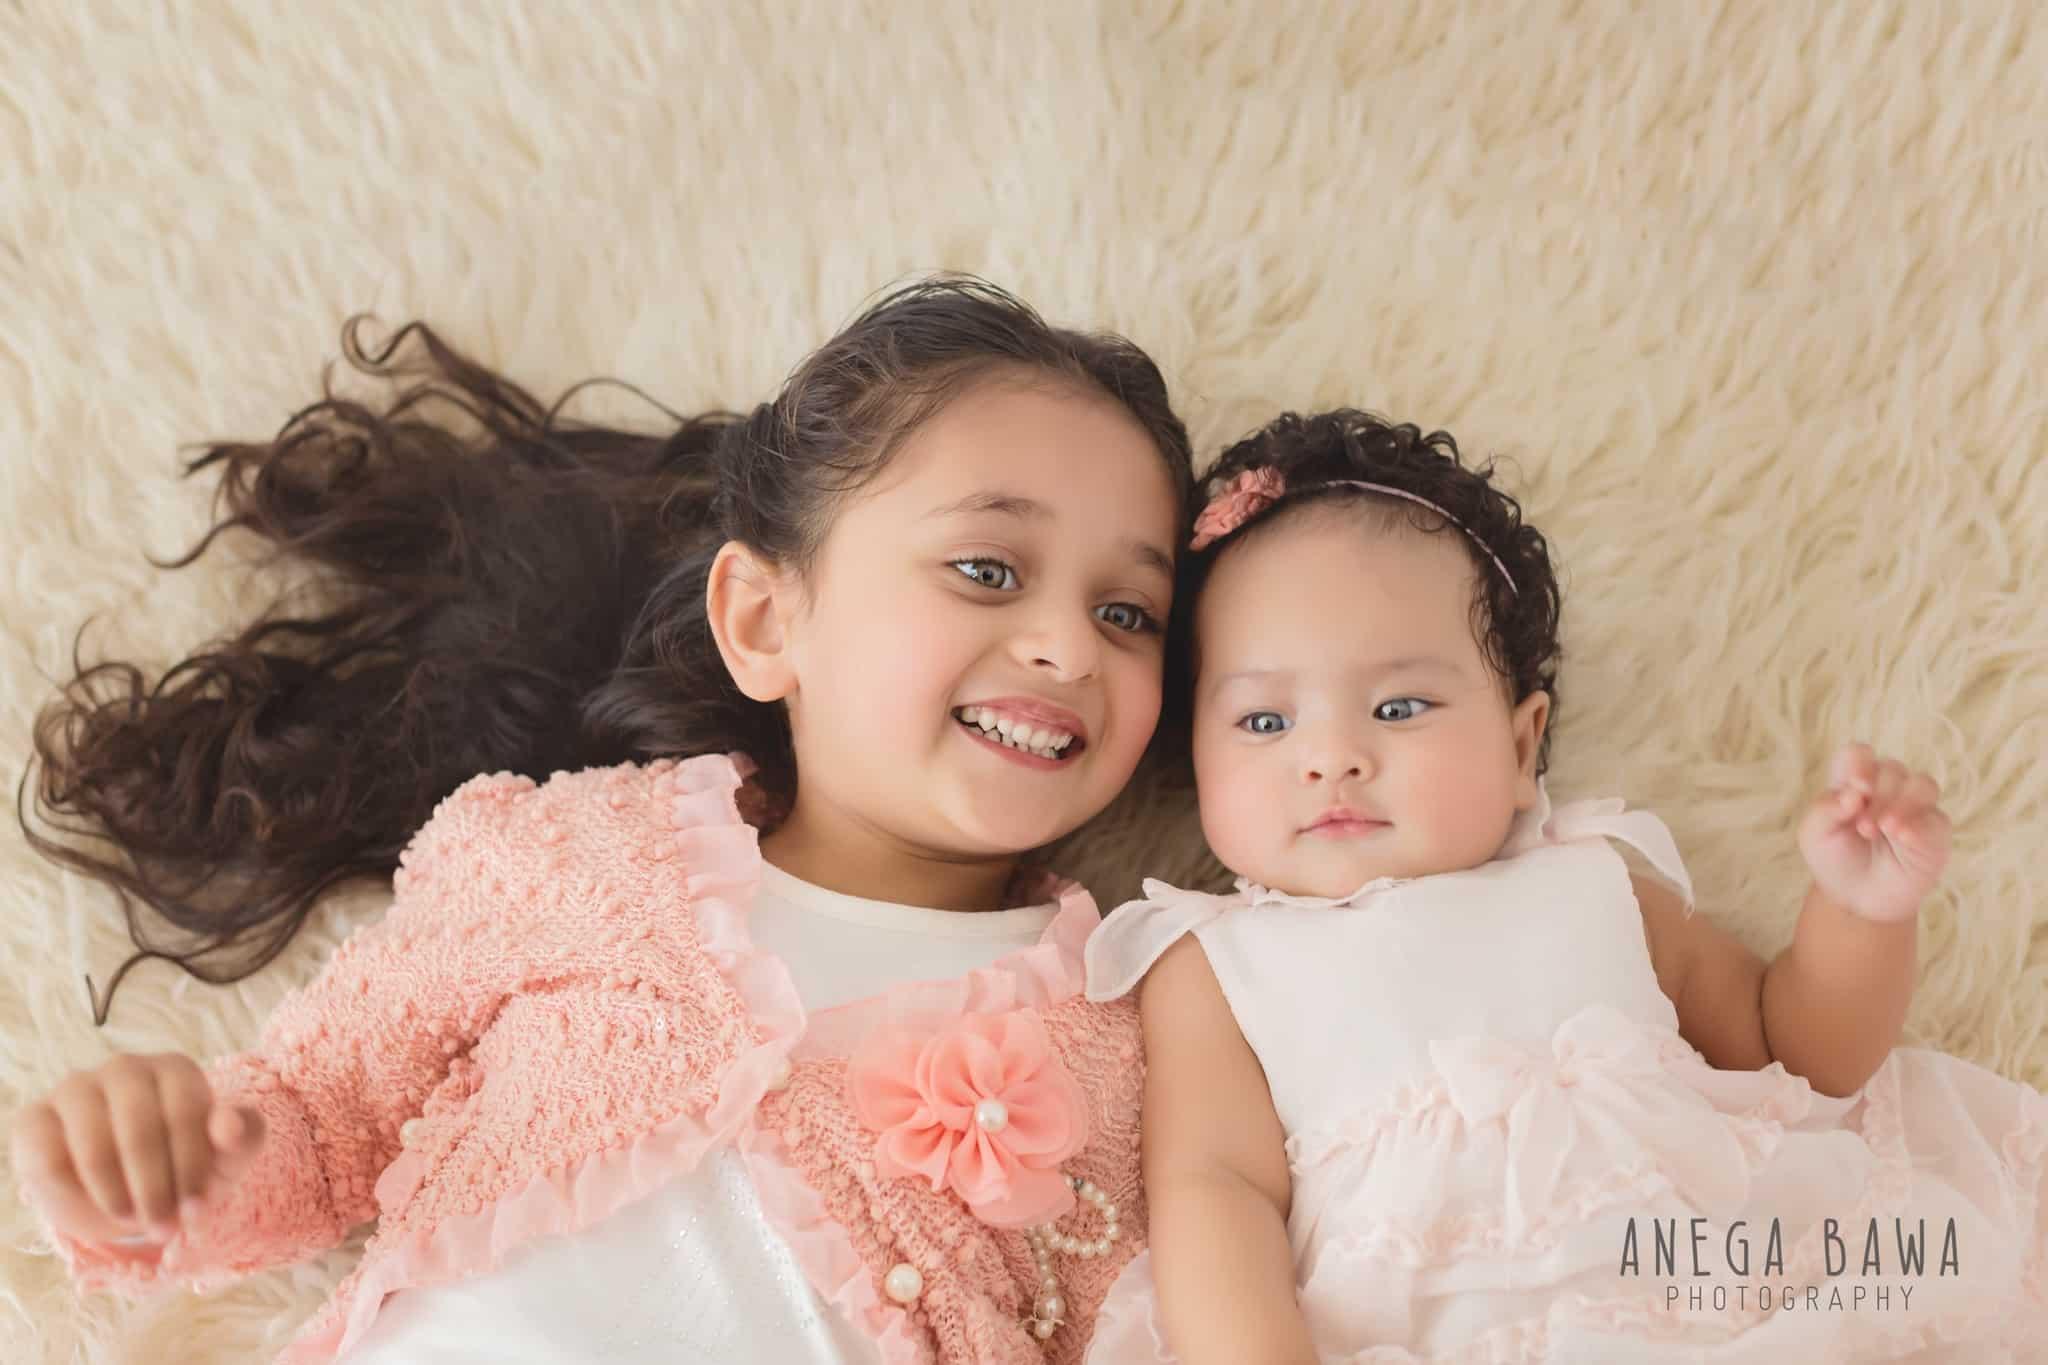 001_baby_photography_delhi_gurgaon_noida_anega_bawa_photography